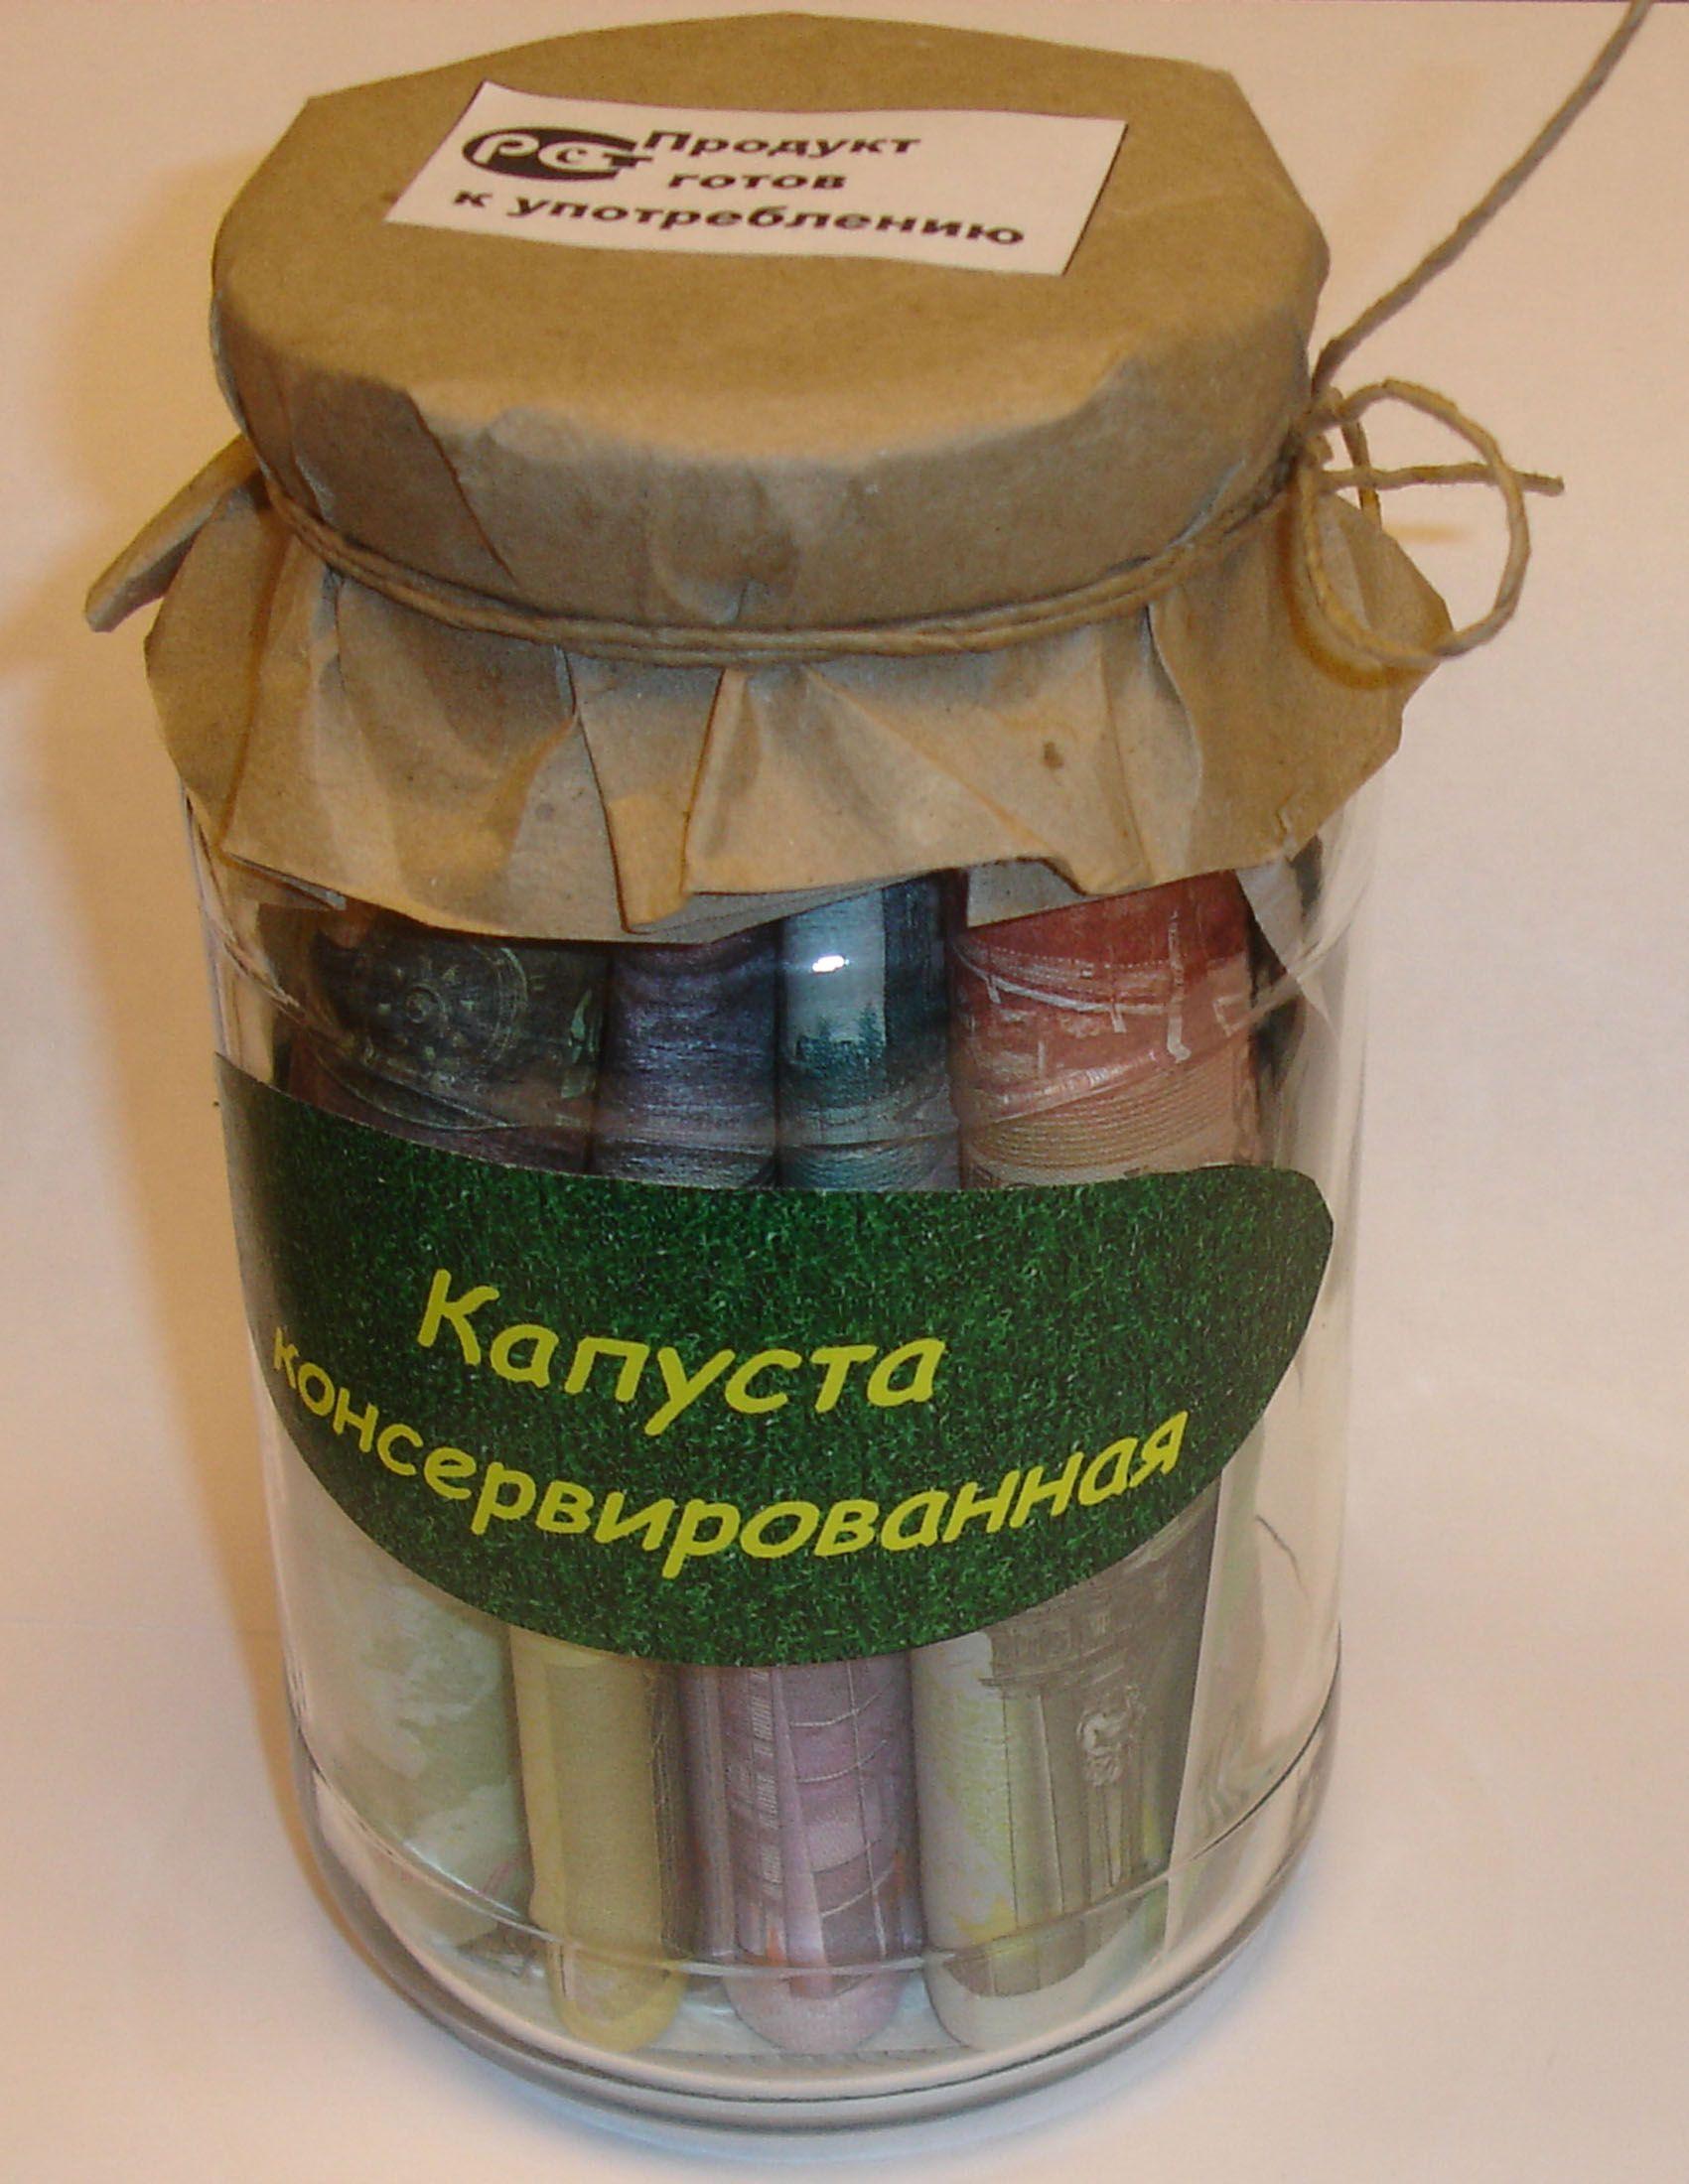 Августа картинки, картинка на банку с деньгами на свадьбу